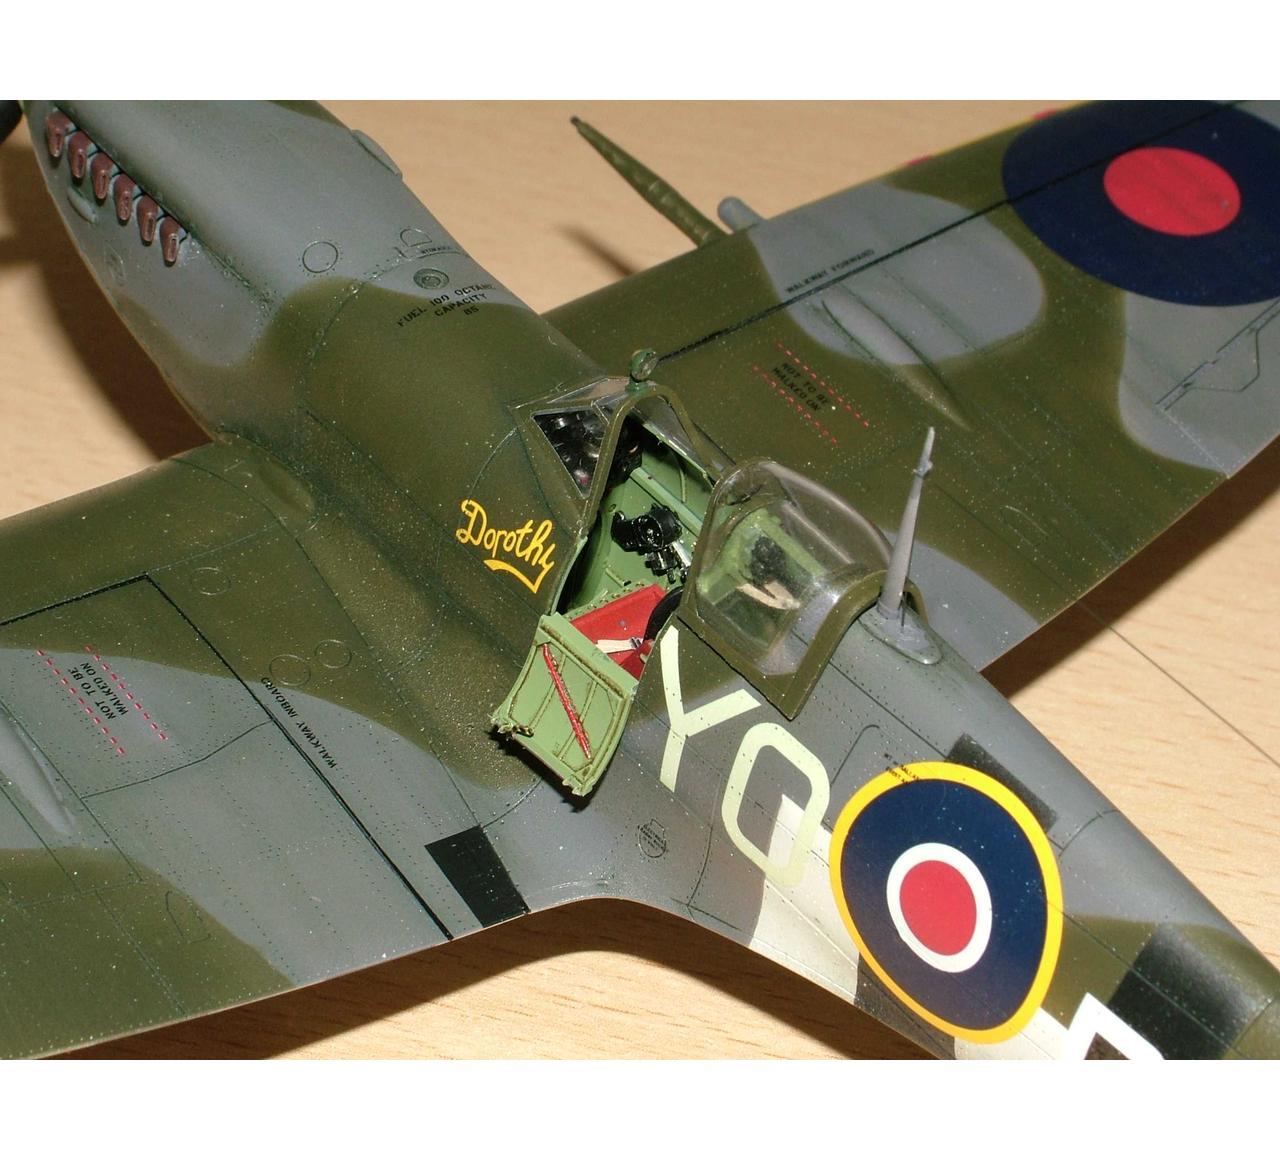 Spitfire Mk Ixc Late Version 1 48 Eduard Store